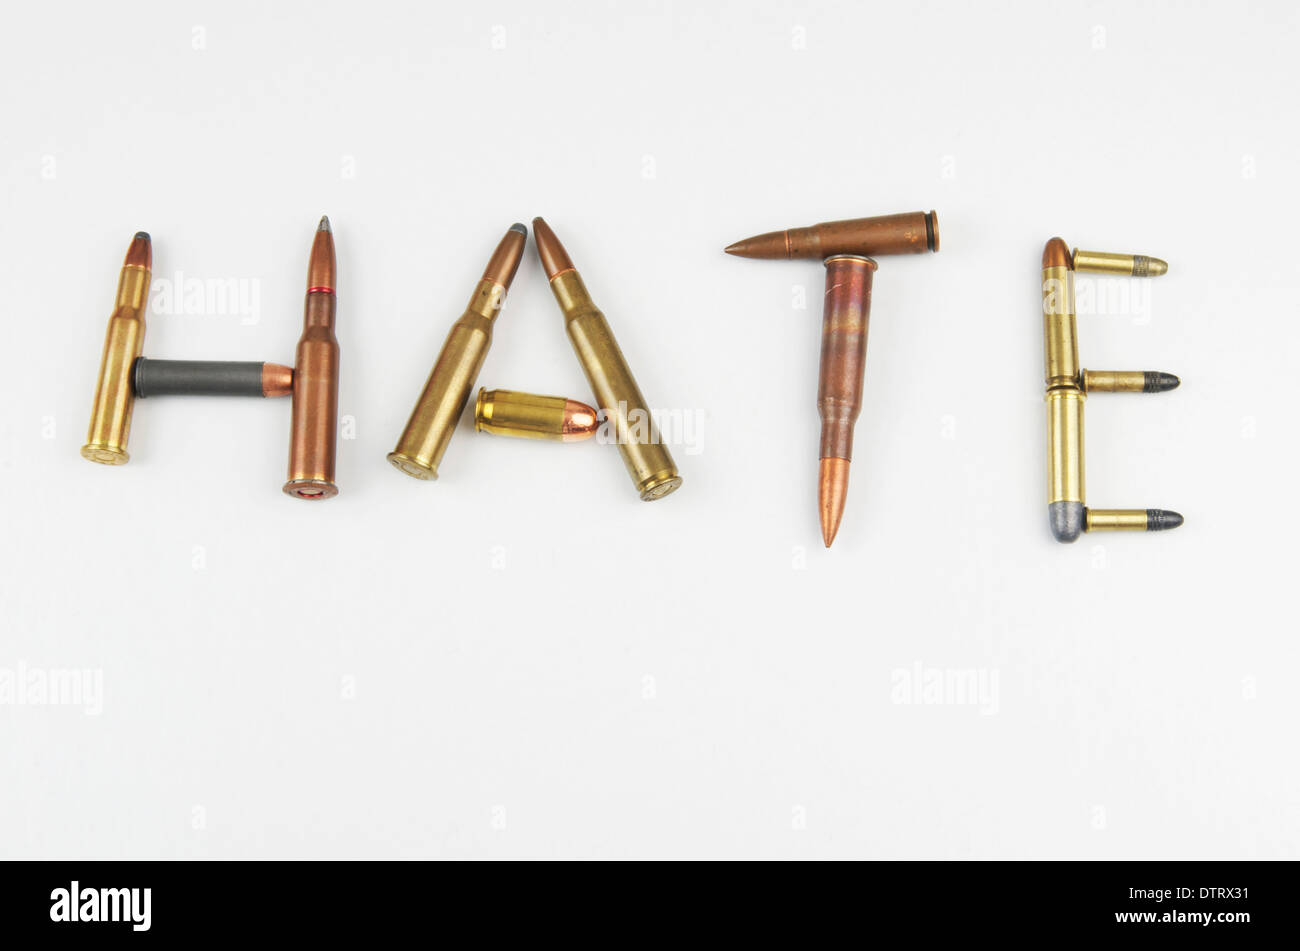 "Bullets énonçant le mot ""la haine"". Photo Stock"